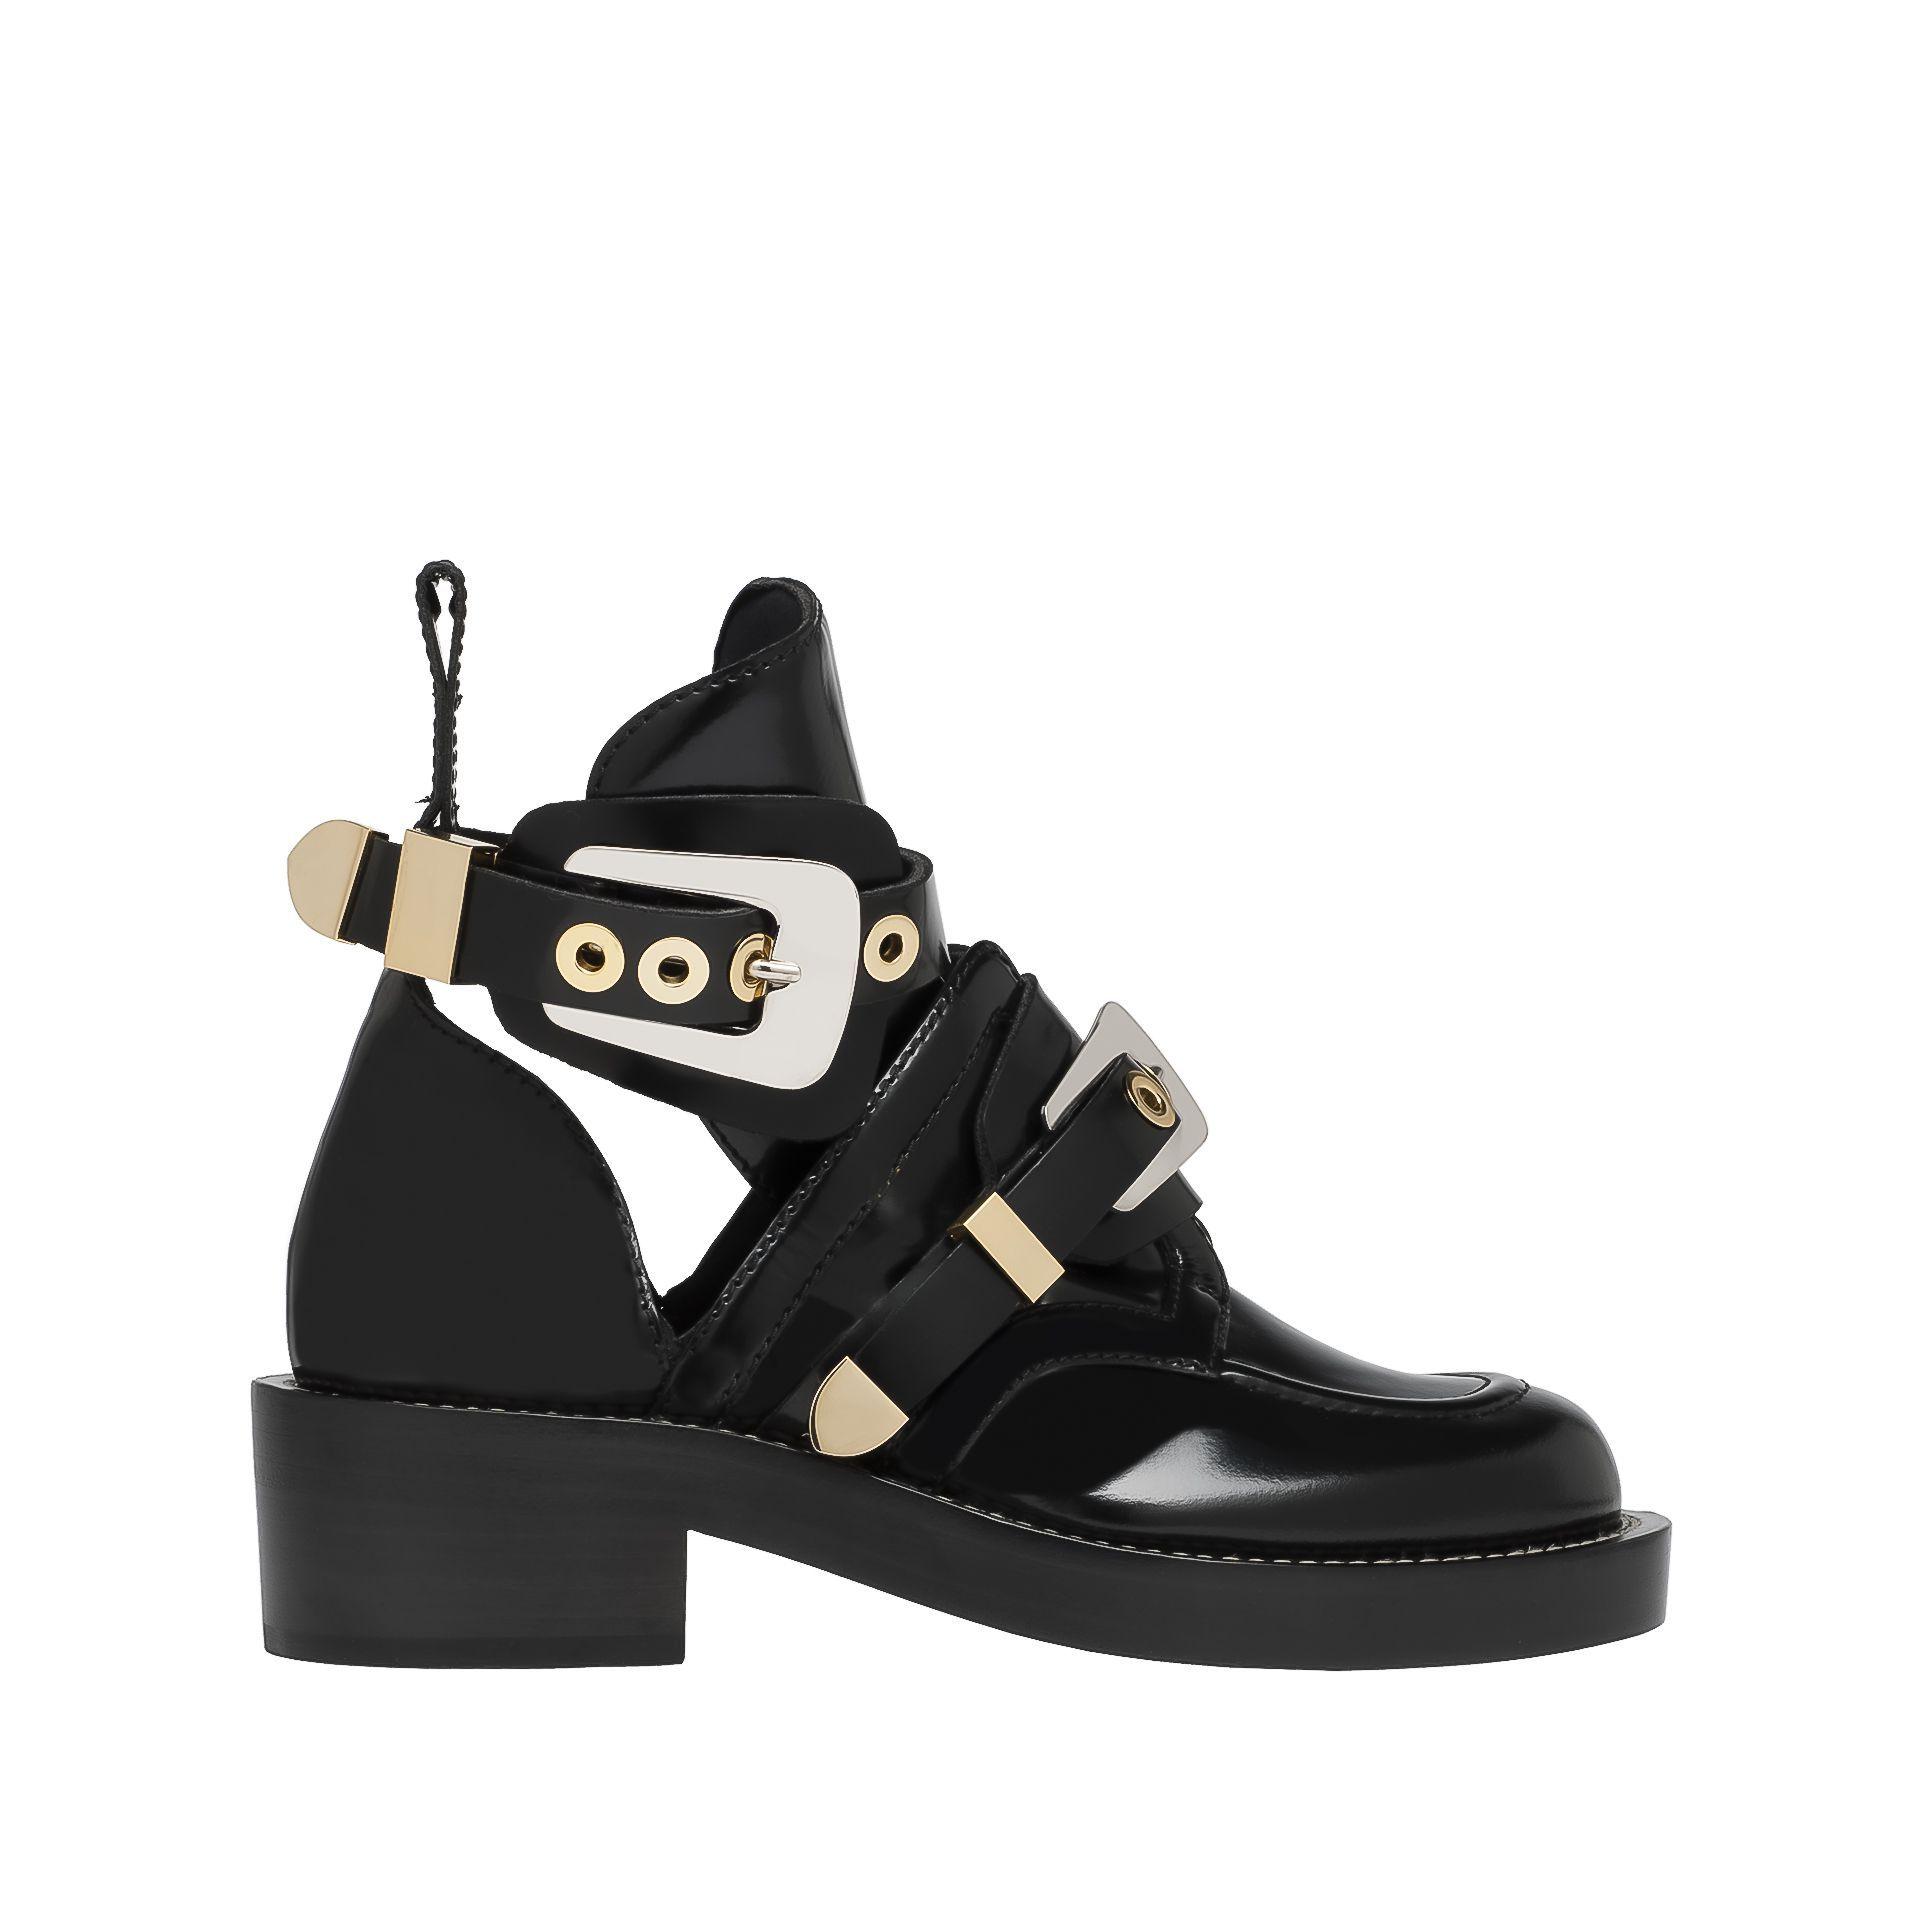 8cd376145b6 Balenciaga Ceinture Ankle Boots Balenciaga - Ankle Boots Women ...